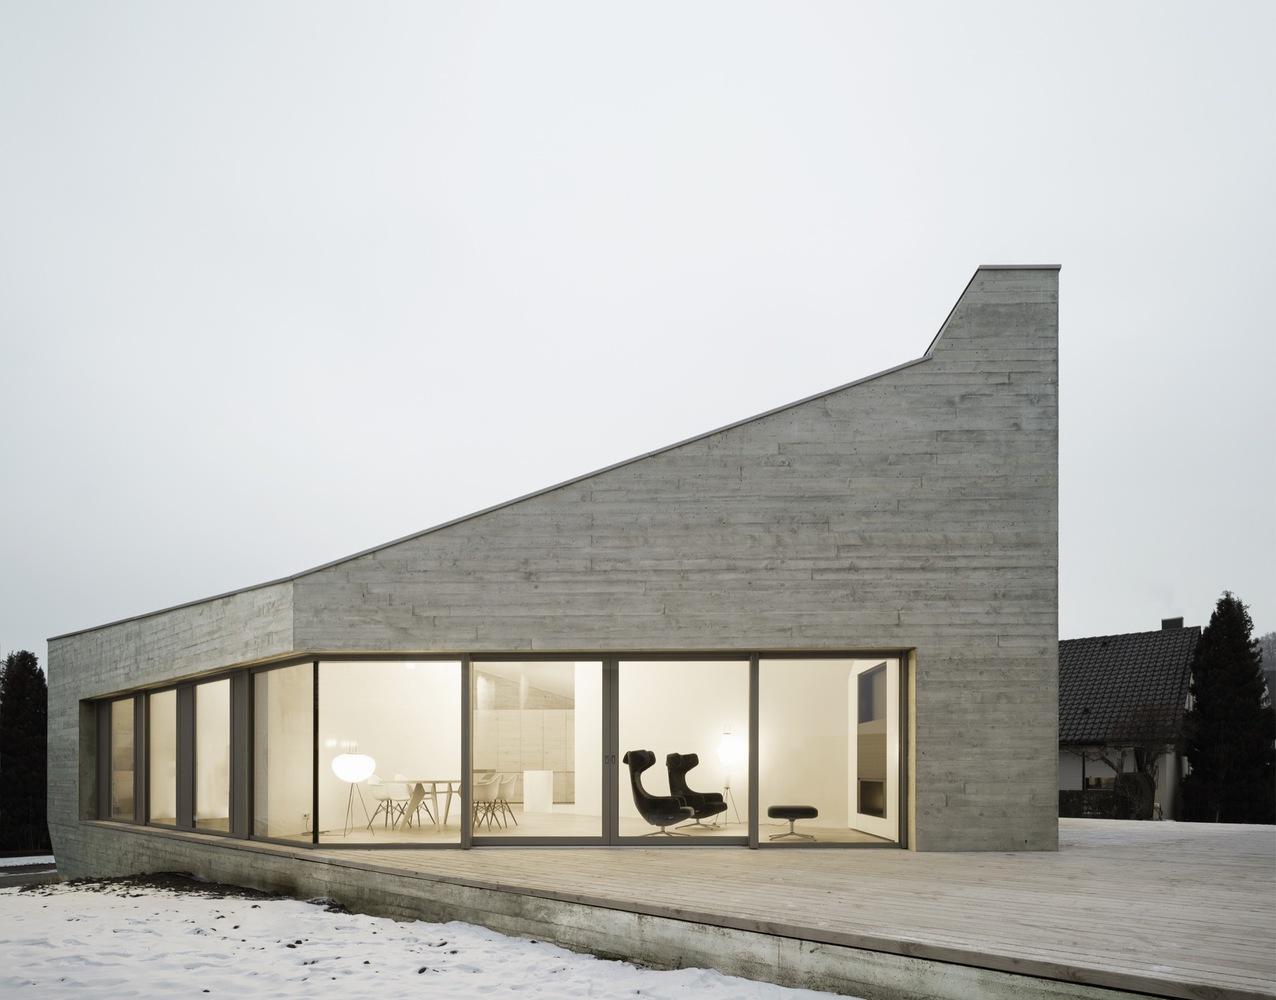 3_E20 Private Residence_STEIMLE ARCHITEKTEN BDA_Inspirationist